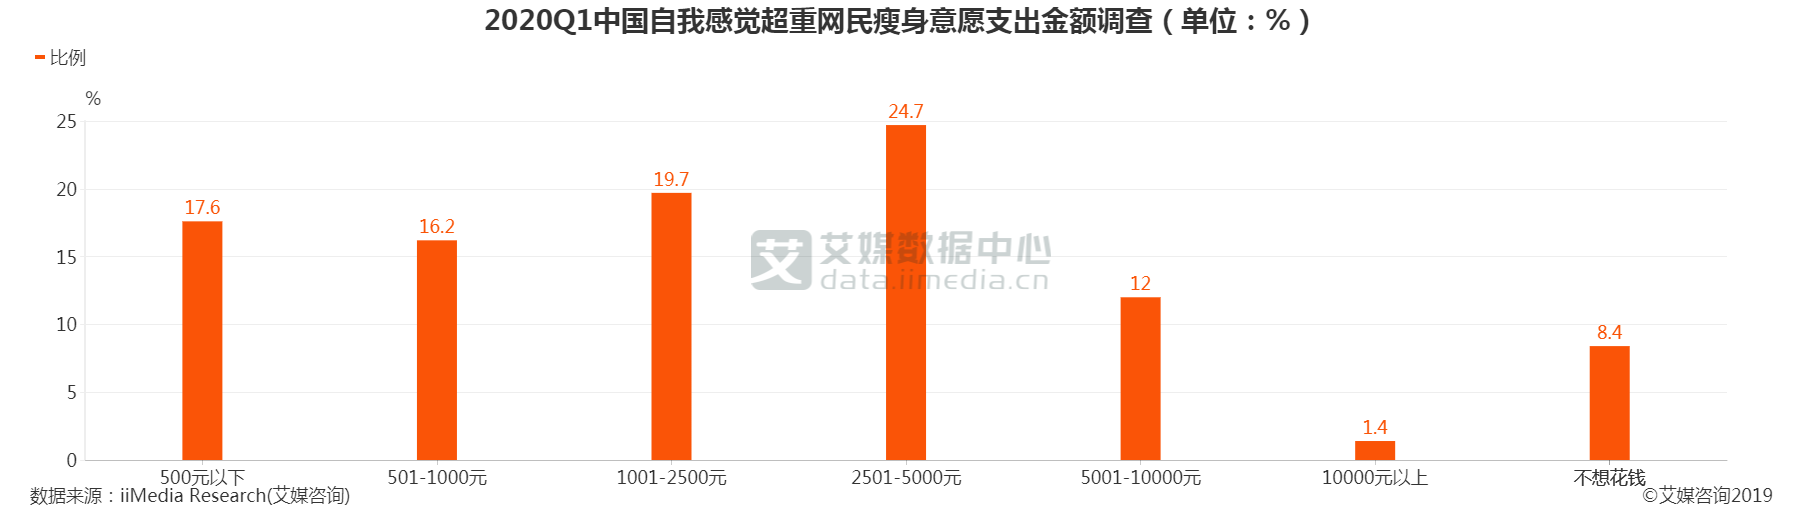 2020Q1中国自我感觉超重网民瘦身意愿支出金额